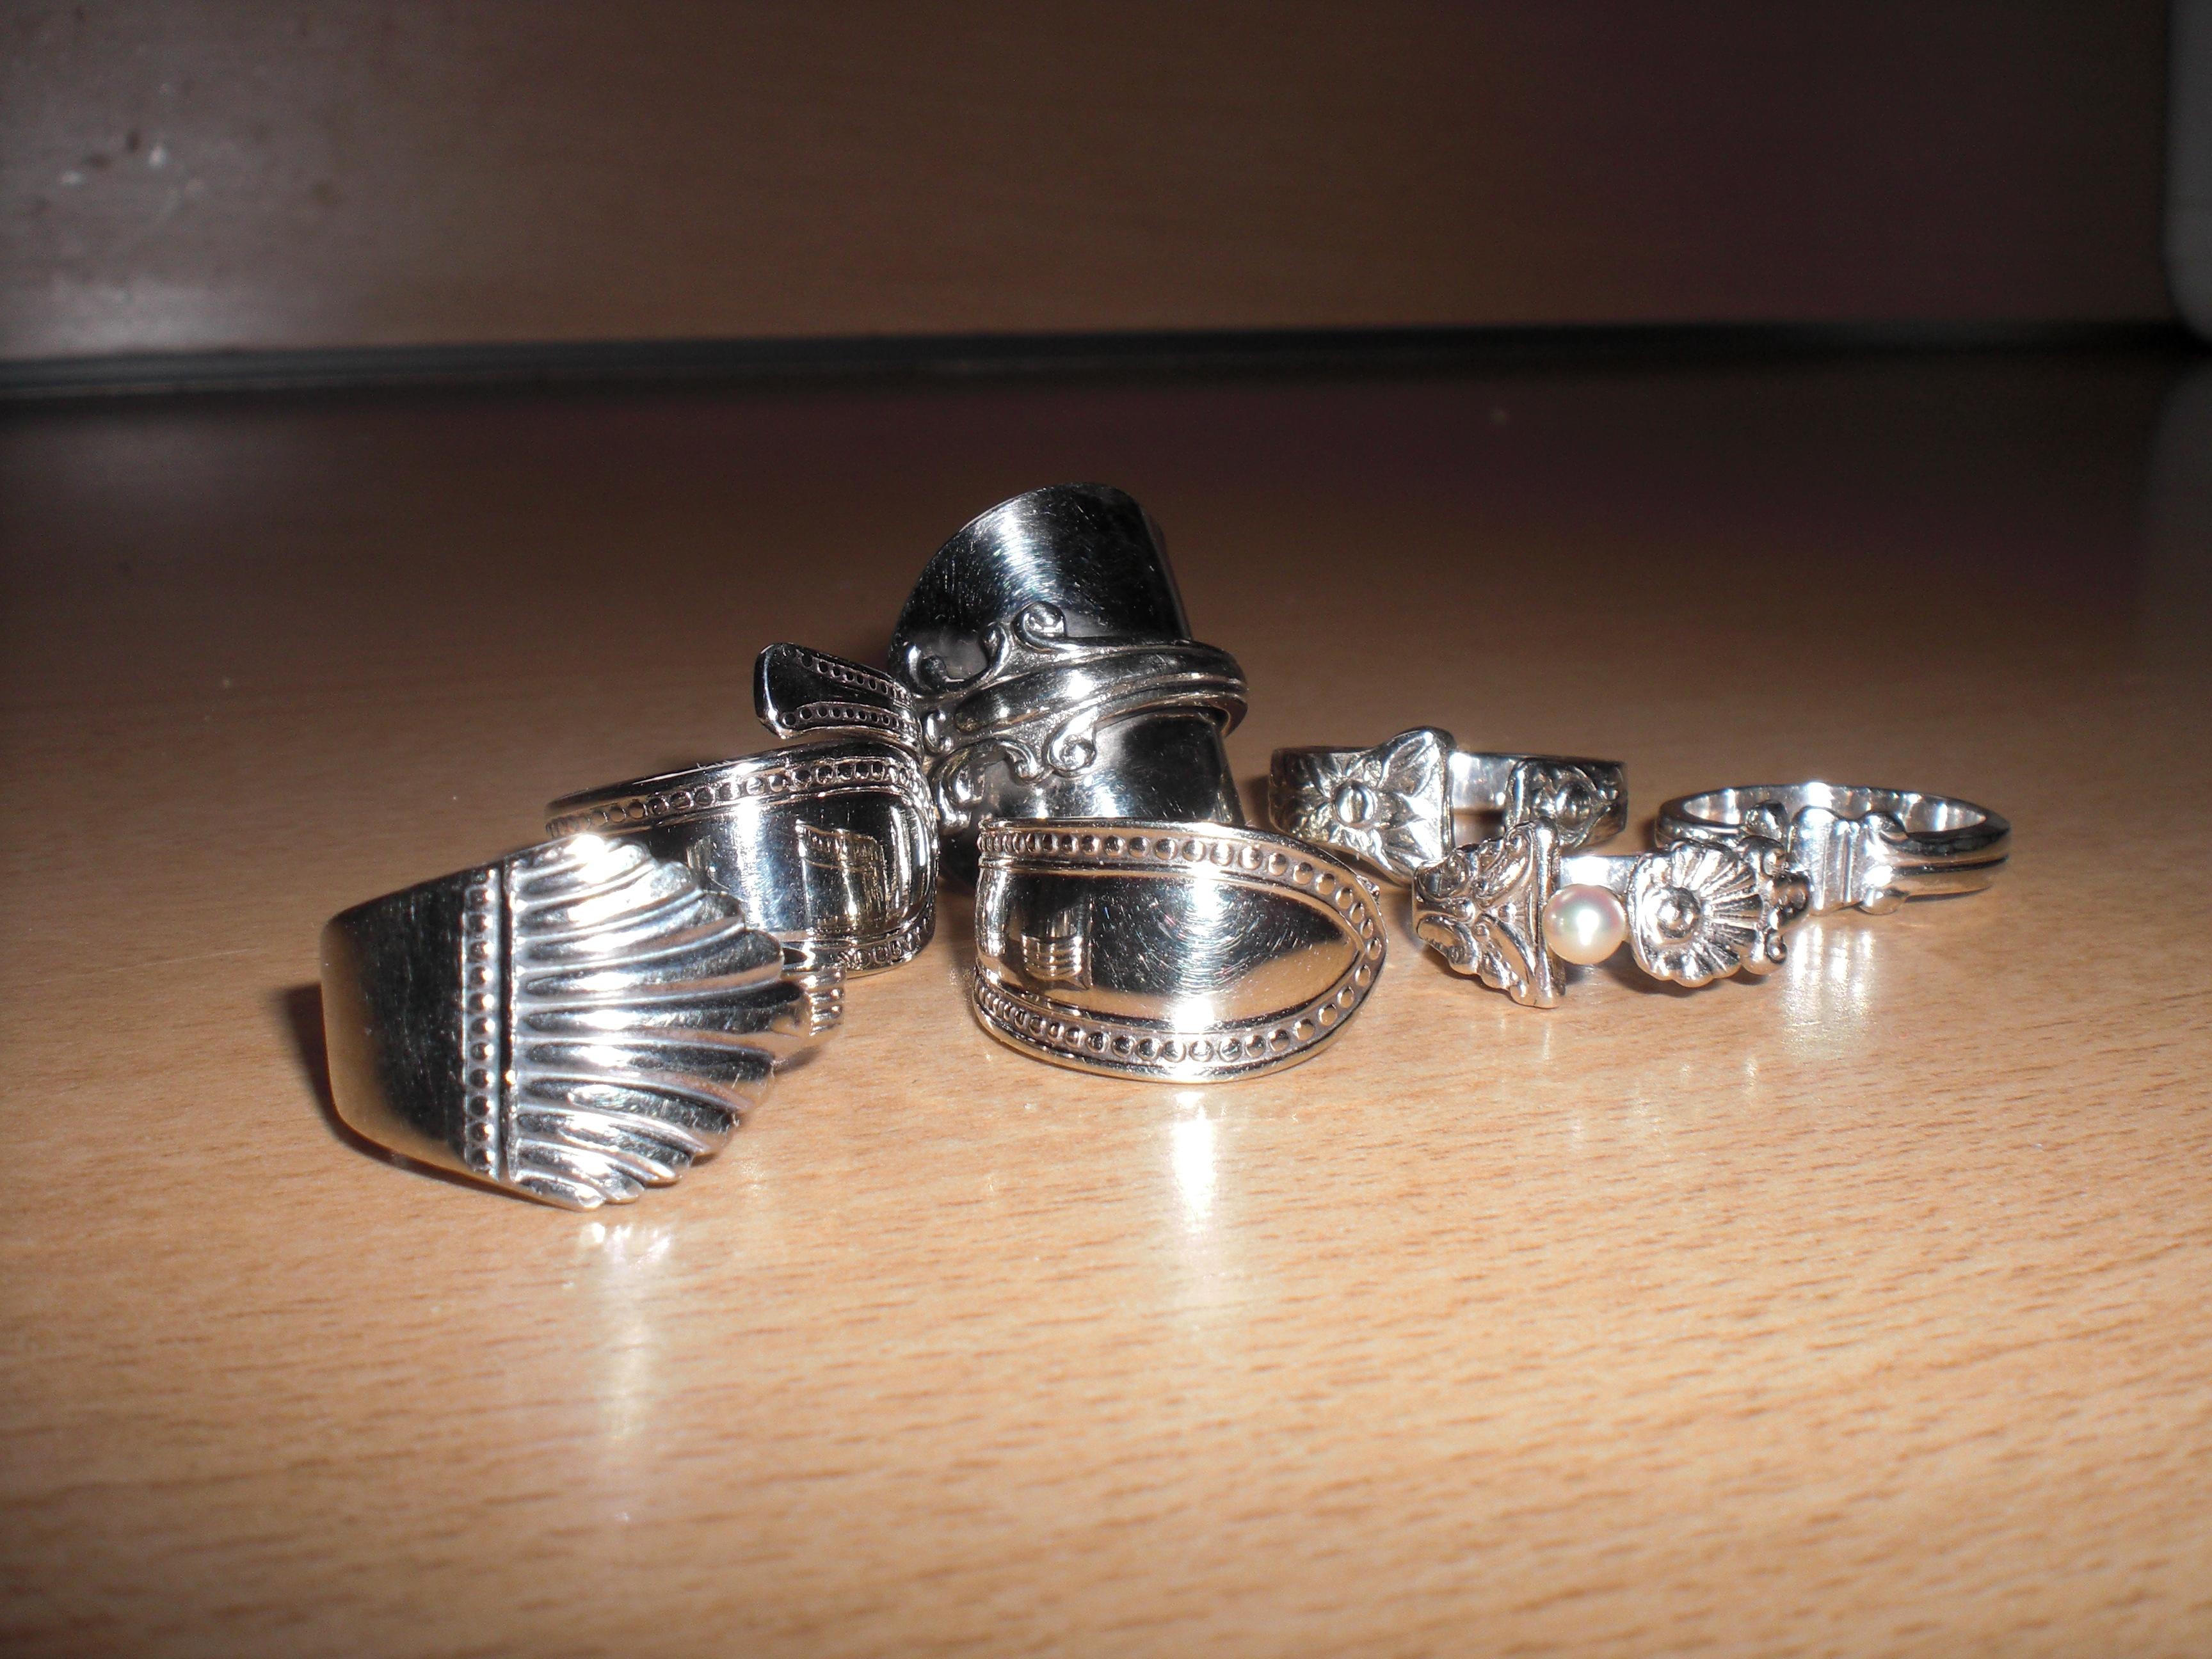 Workshop theelepel-ring maken